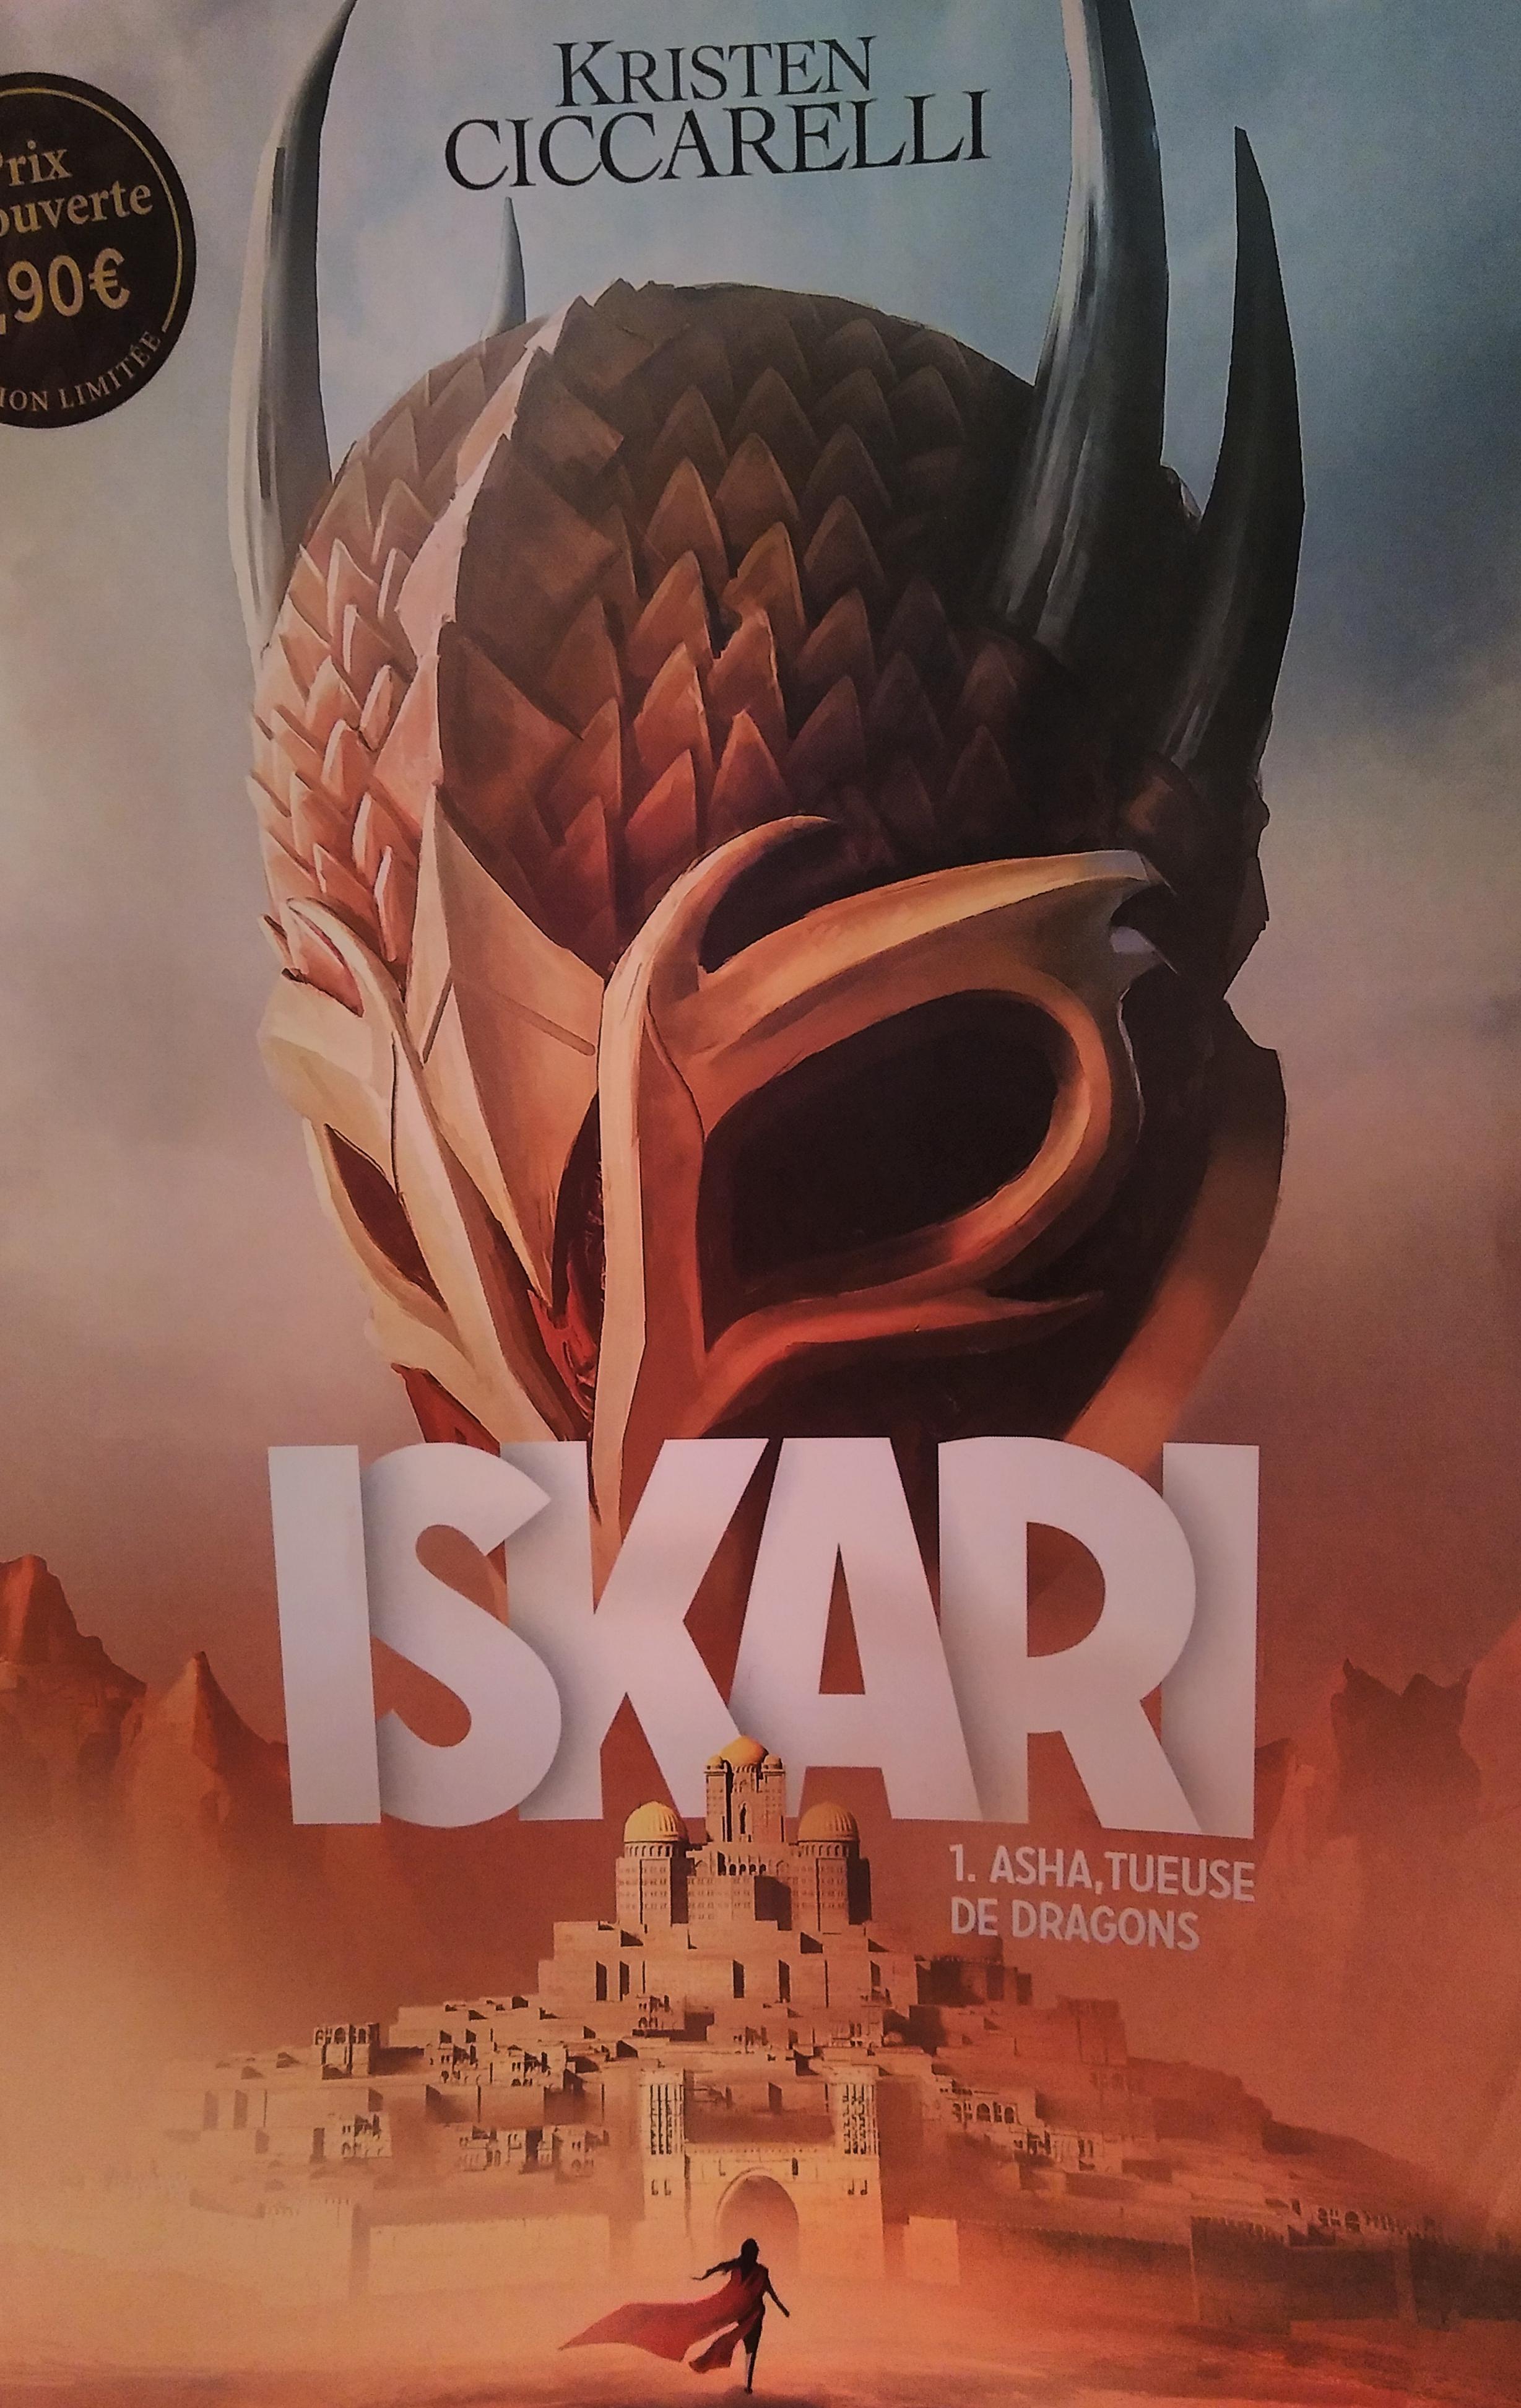 iskari